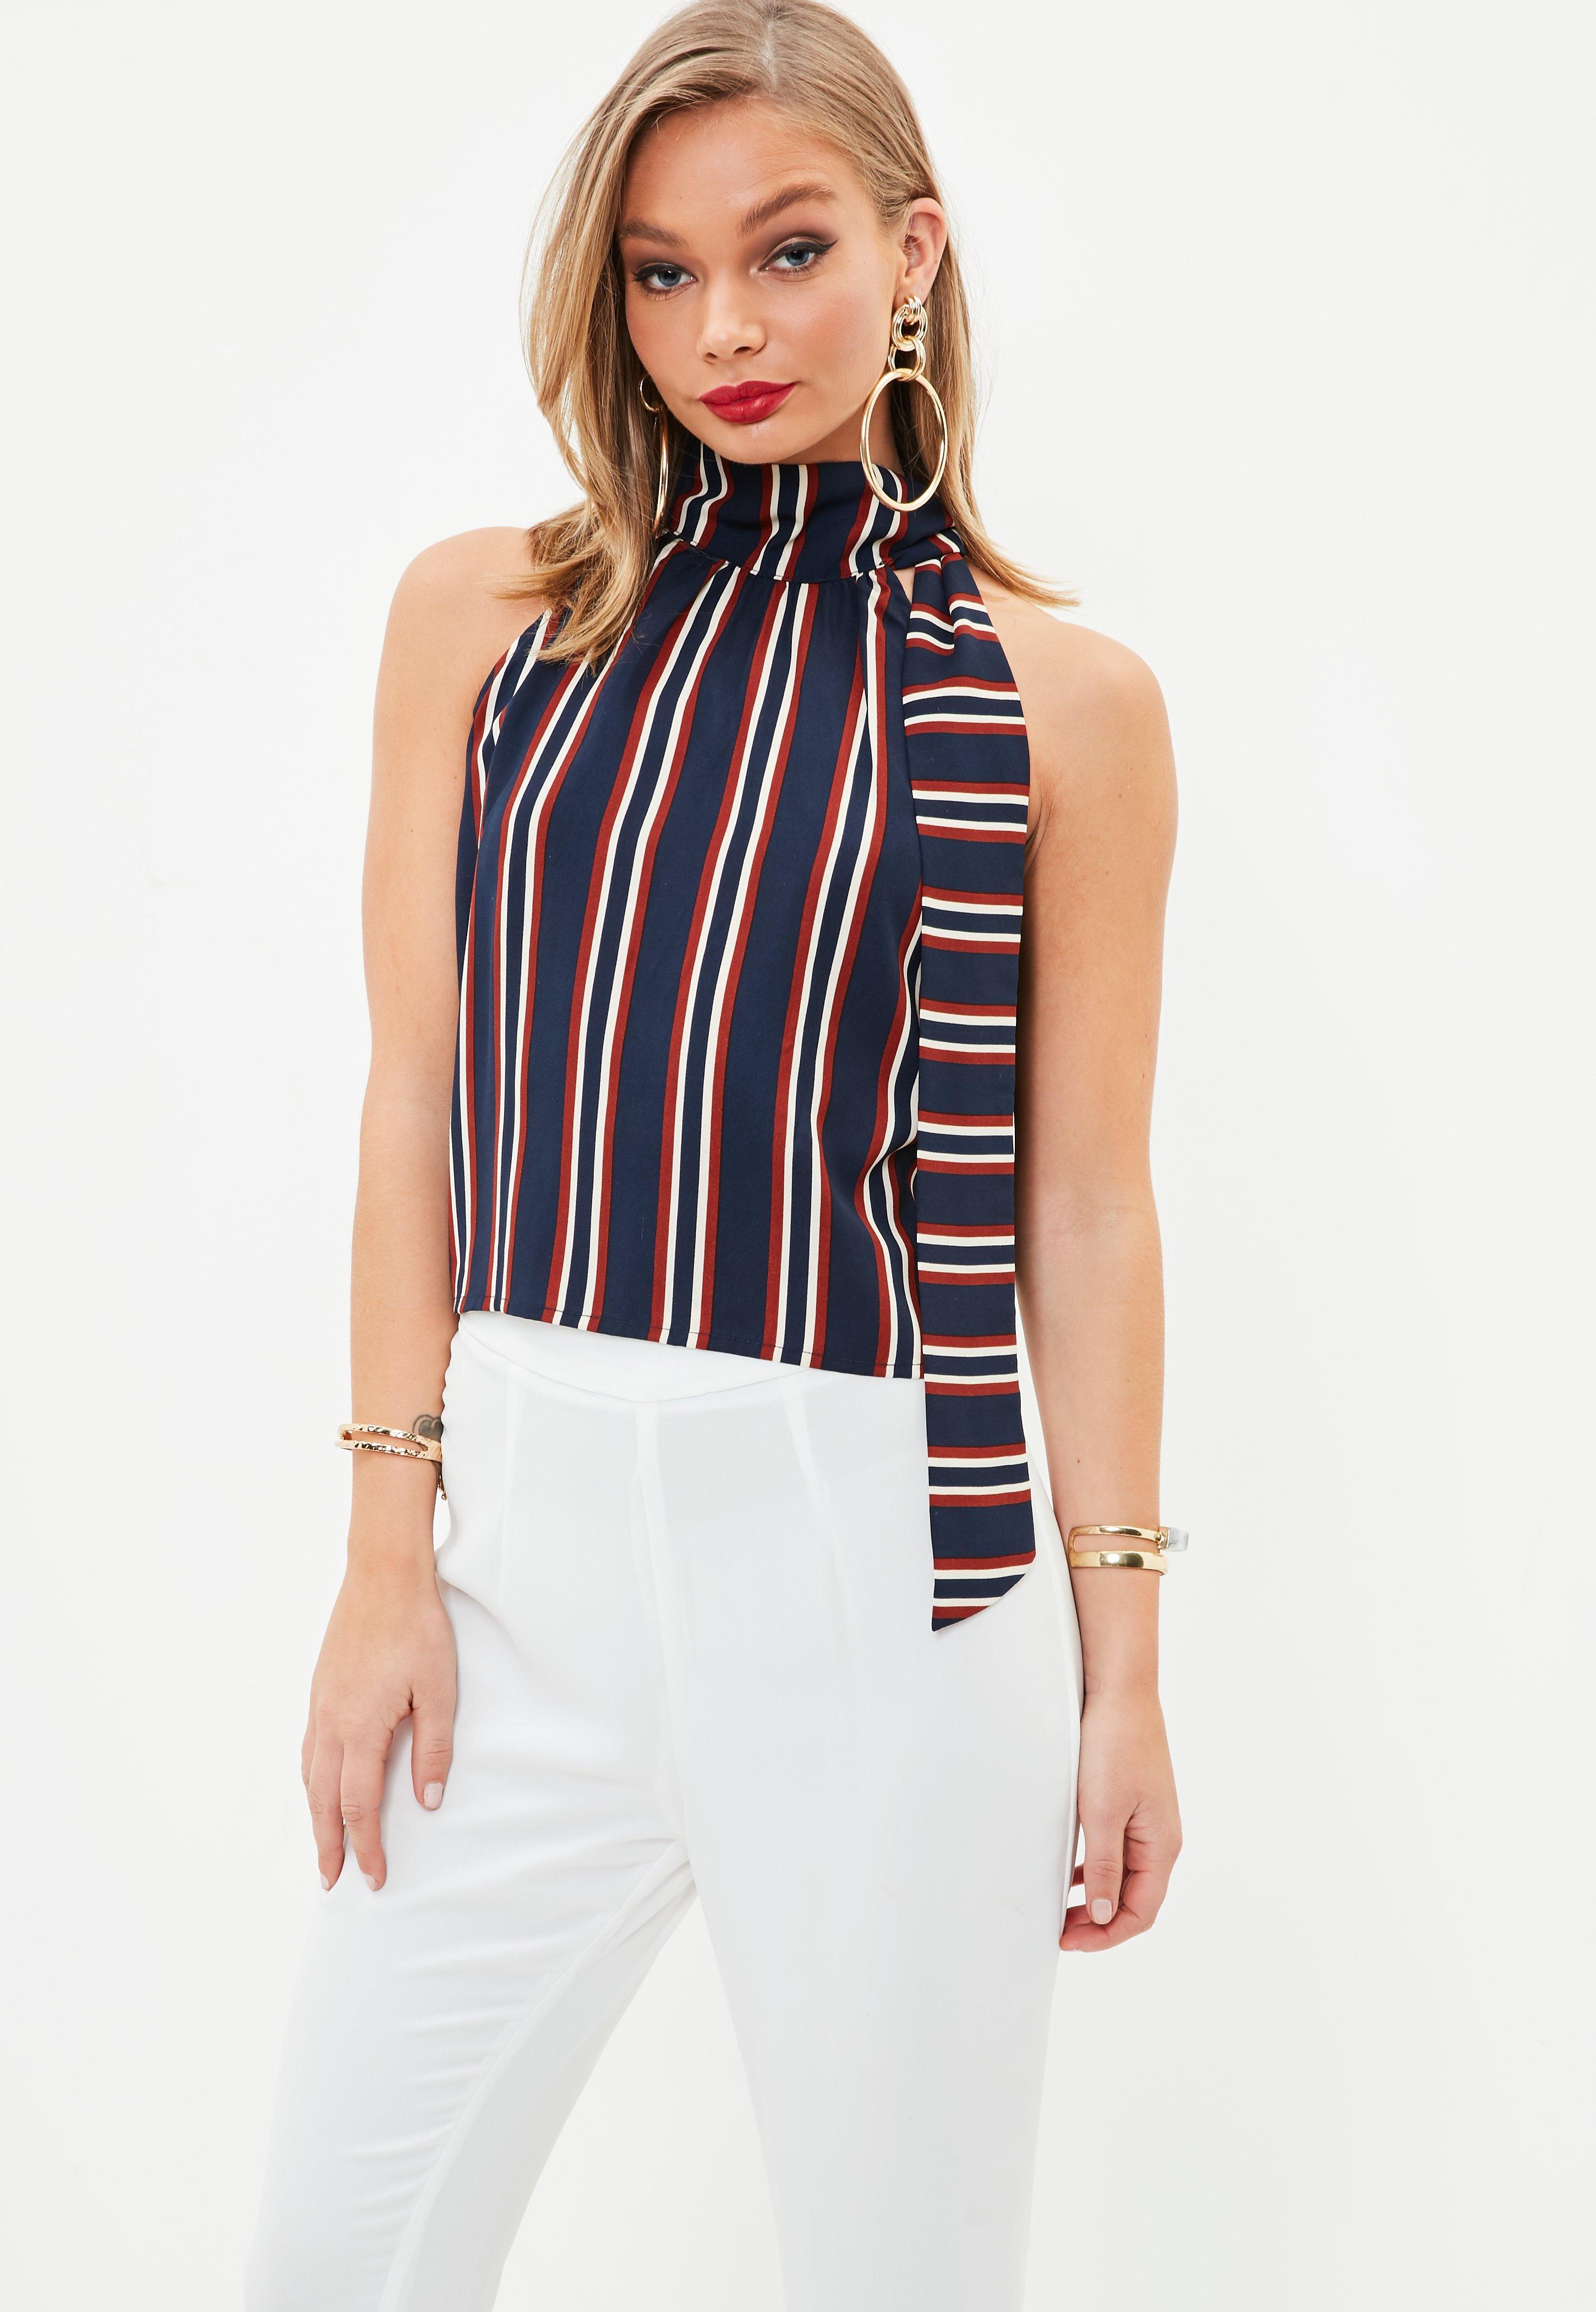 a5282737d1aab Lyst - Missguided Navy Tie Halter Neck Stripe Crop Top in Blue